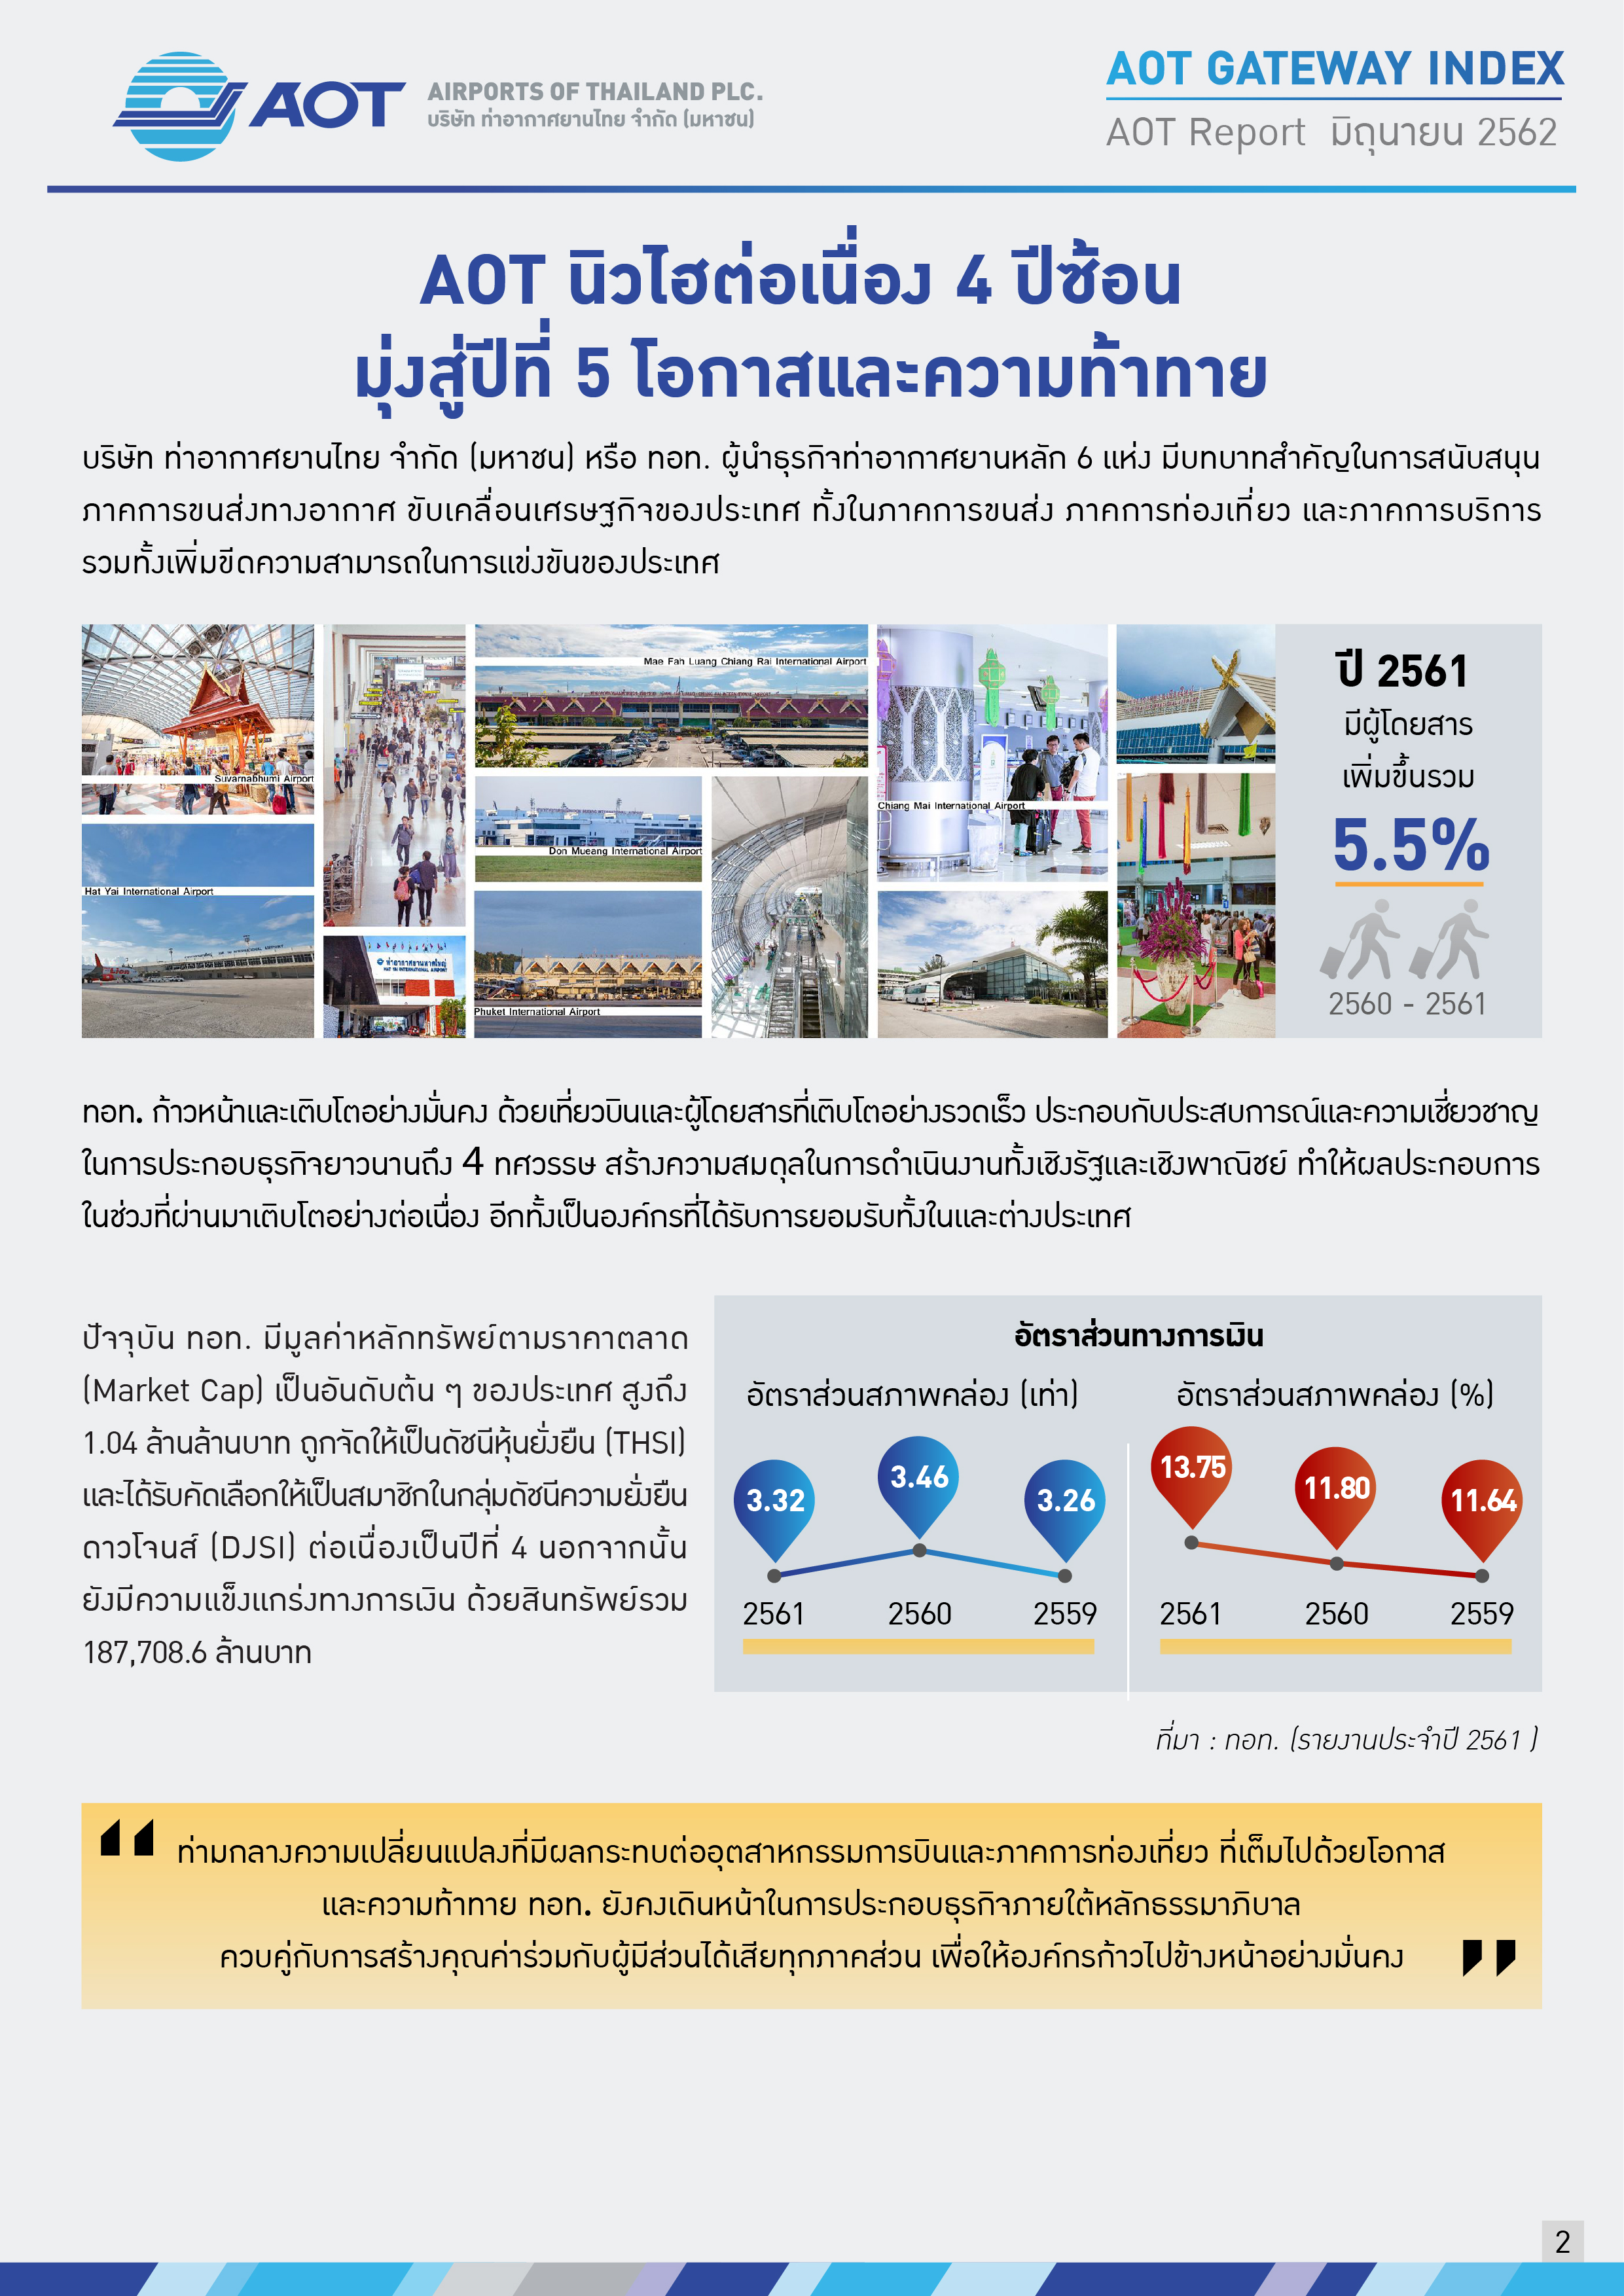 AOTcontent2019_Index7_AOT นิวไฮต่อเนื่อง 4 ปีซ้อน _ มุ่งสู่ปีที่ 5 โอกาสและความท้าทาย_V3_20190828_Page02